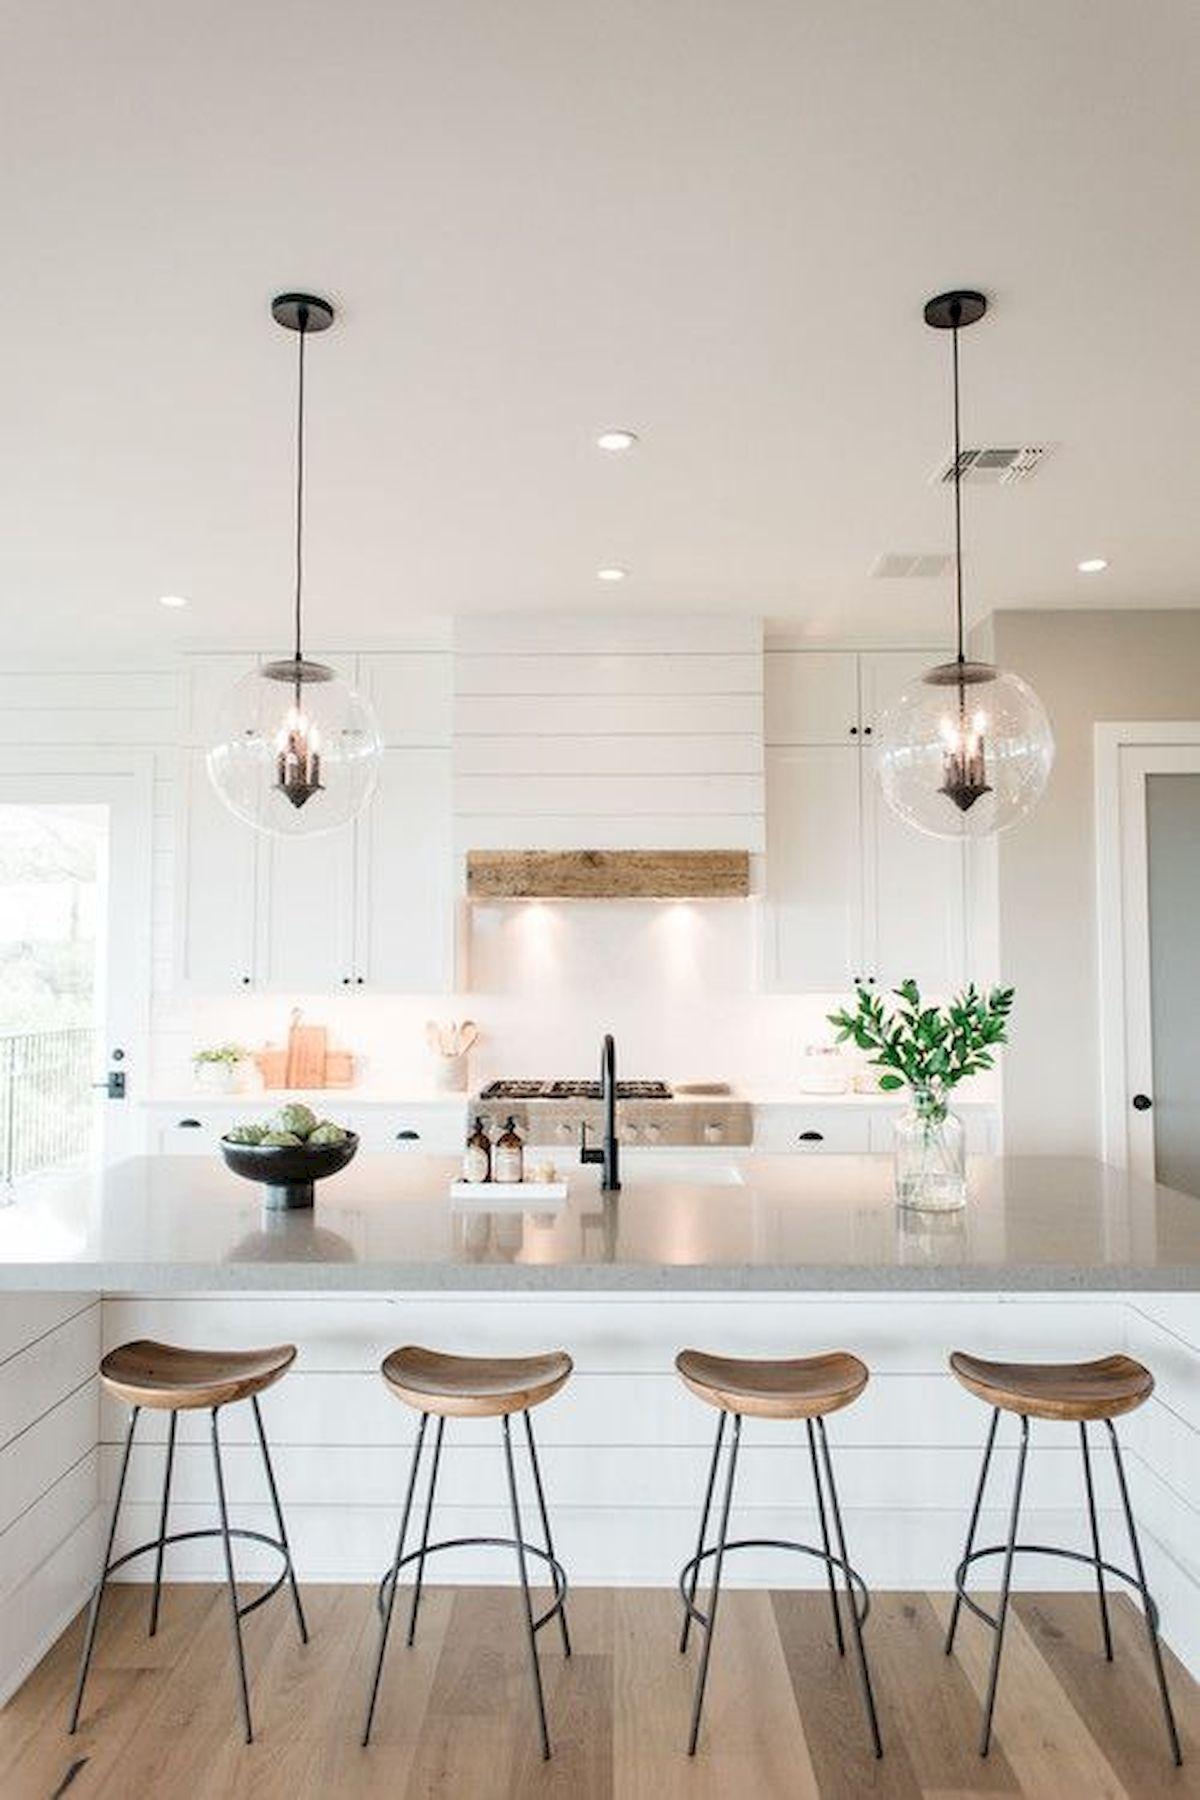 50 best modern farmhouse kitchen island decor ideas 13 home decor kitchen kitchen island on kitchen decor ideas farmhouse id=14626